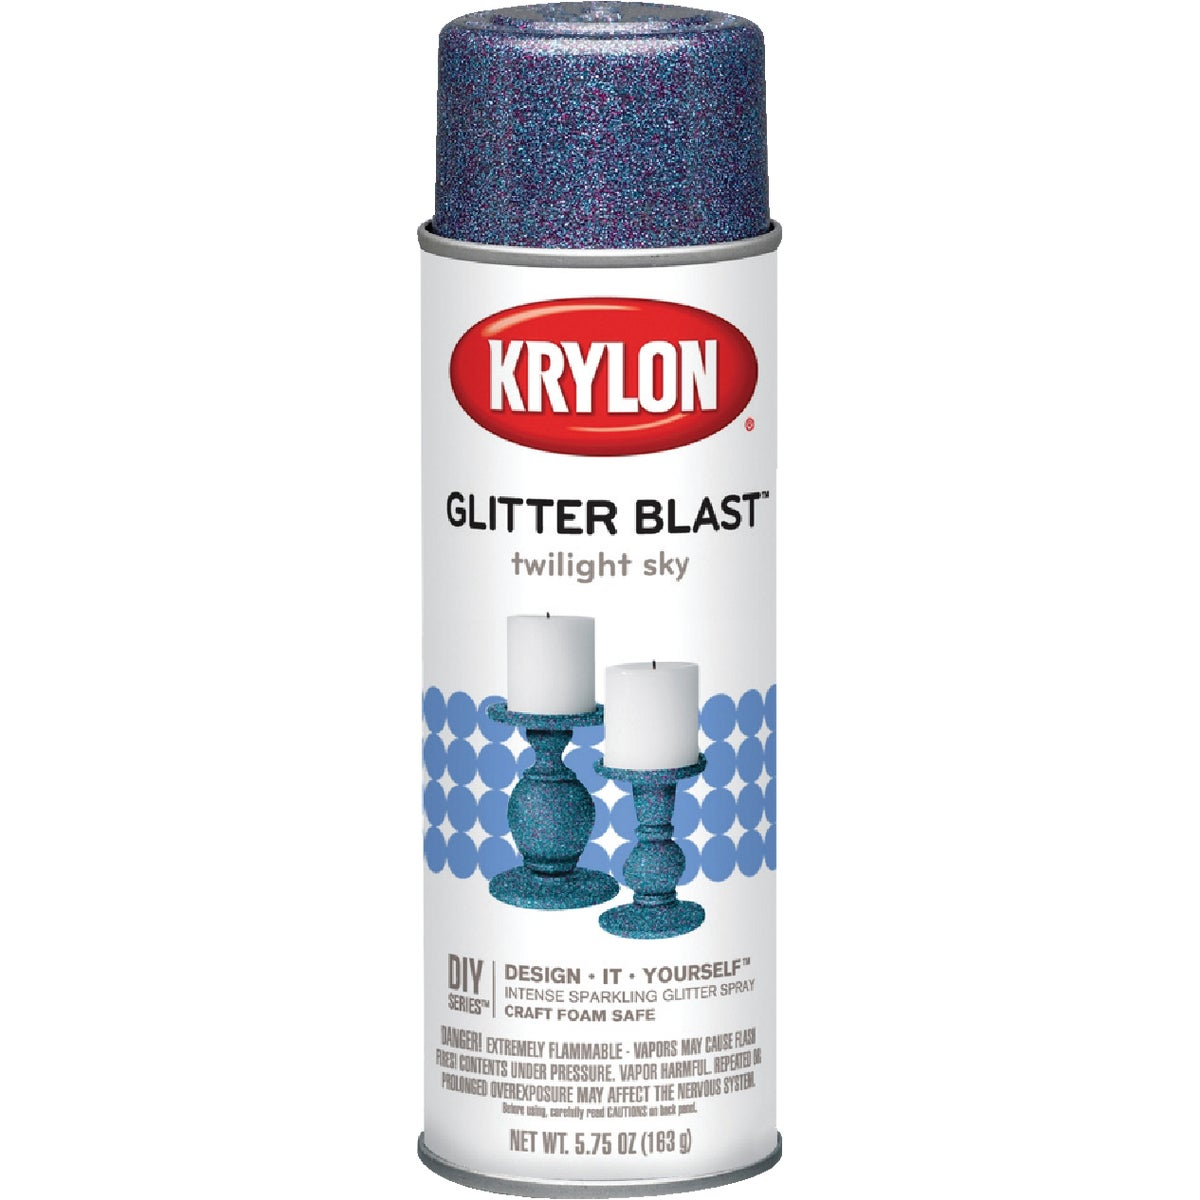 TWLGHT SKY GLITTER SPRAY - K03811000 by Krylon/consumer Div